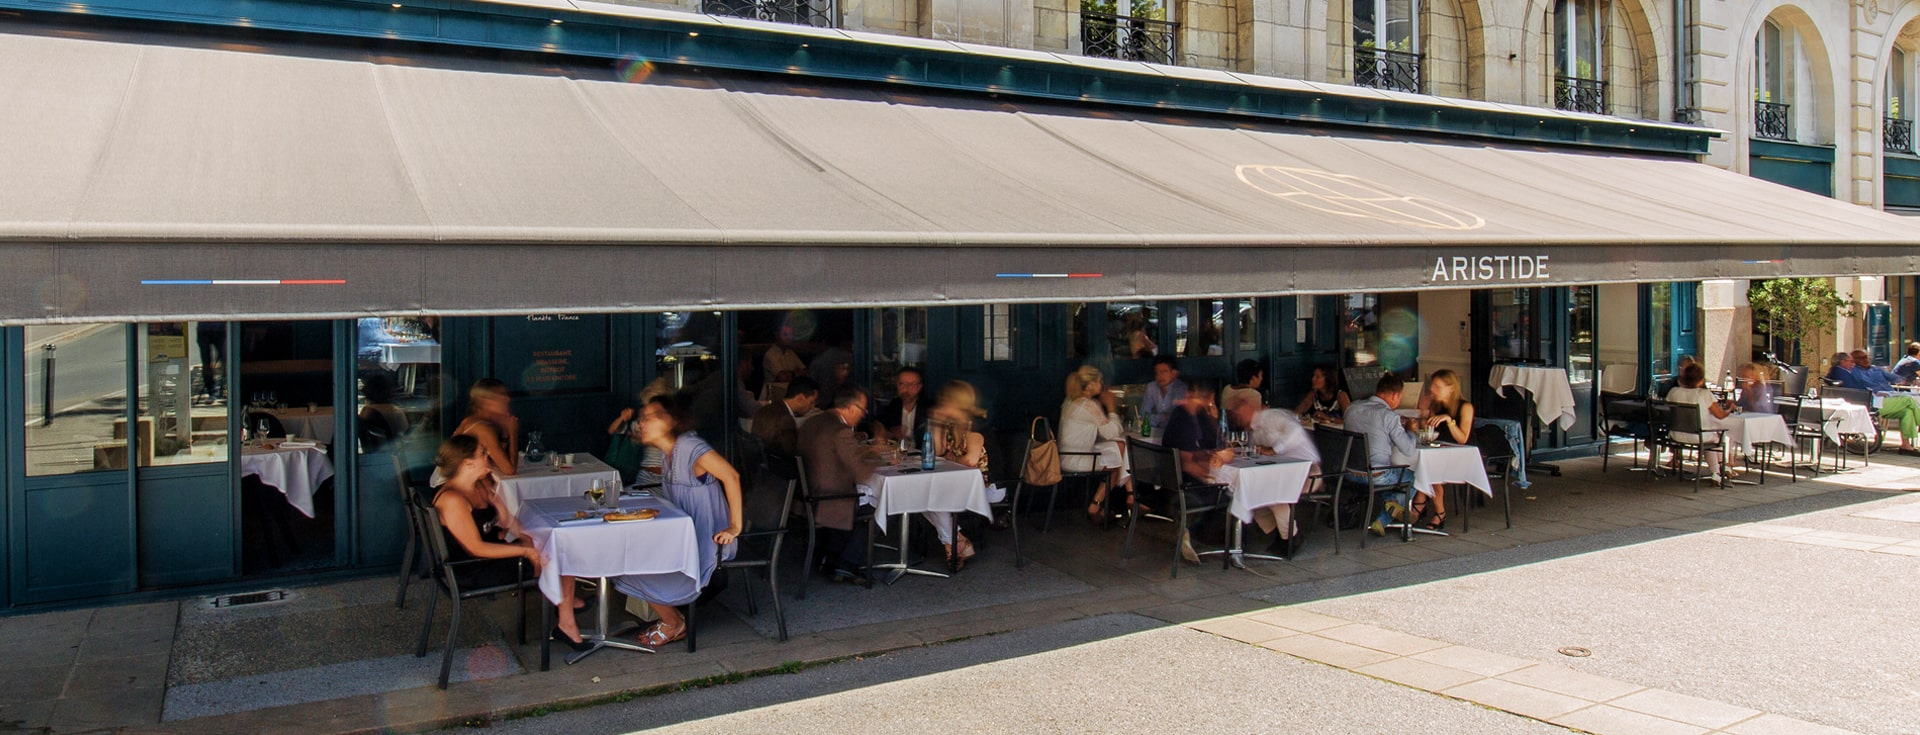 Store Banne Professionnel - Store restaurant - Store Banne Madrid spécial CHR - Restaurant Aristid - Format 4 2-min